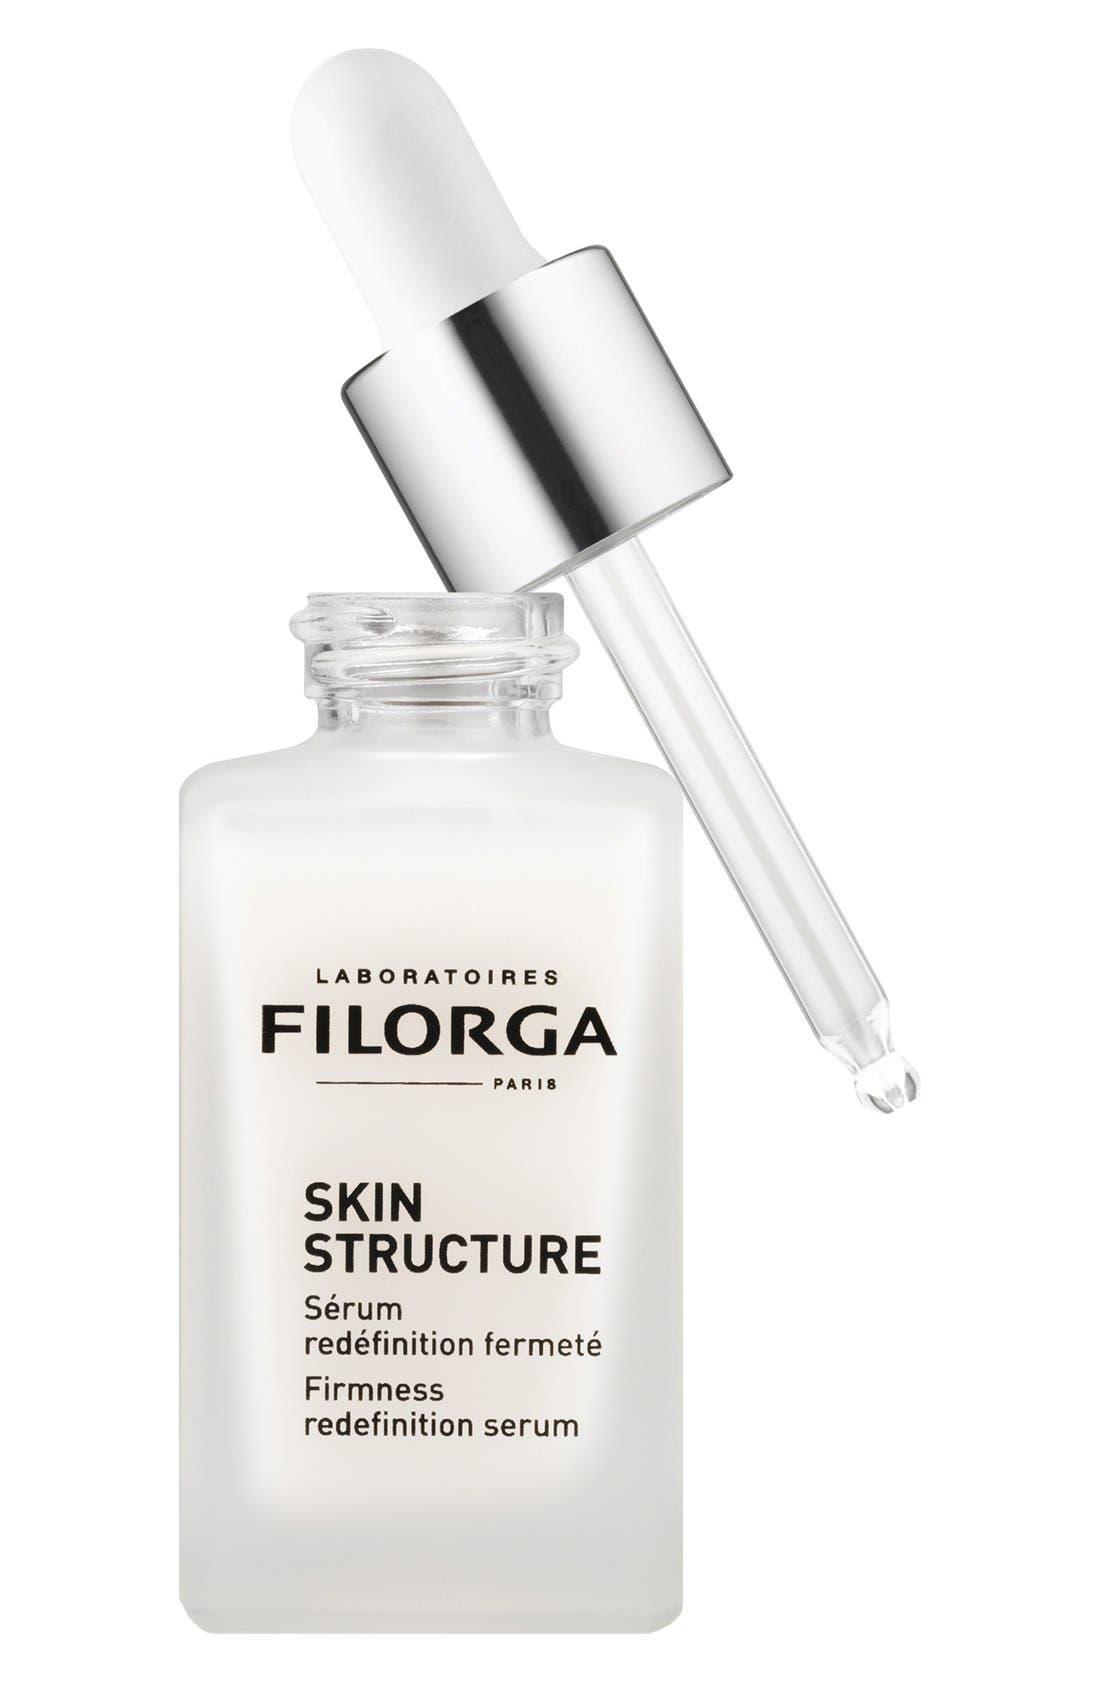 Filorga 'Skin-Structure' Firmness Redefinition Serum